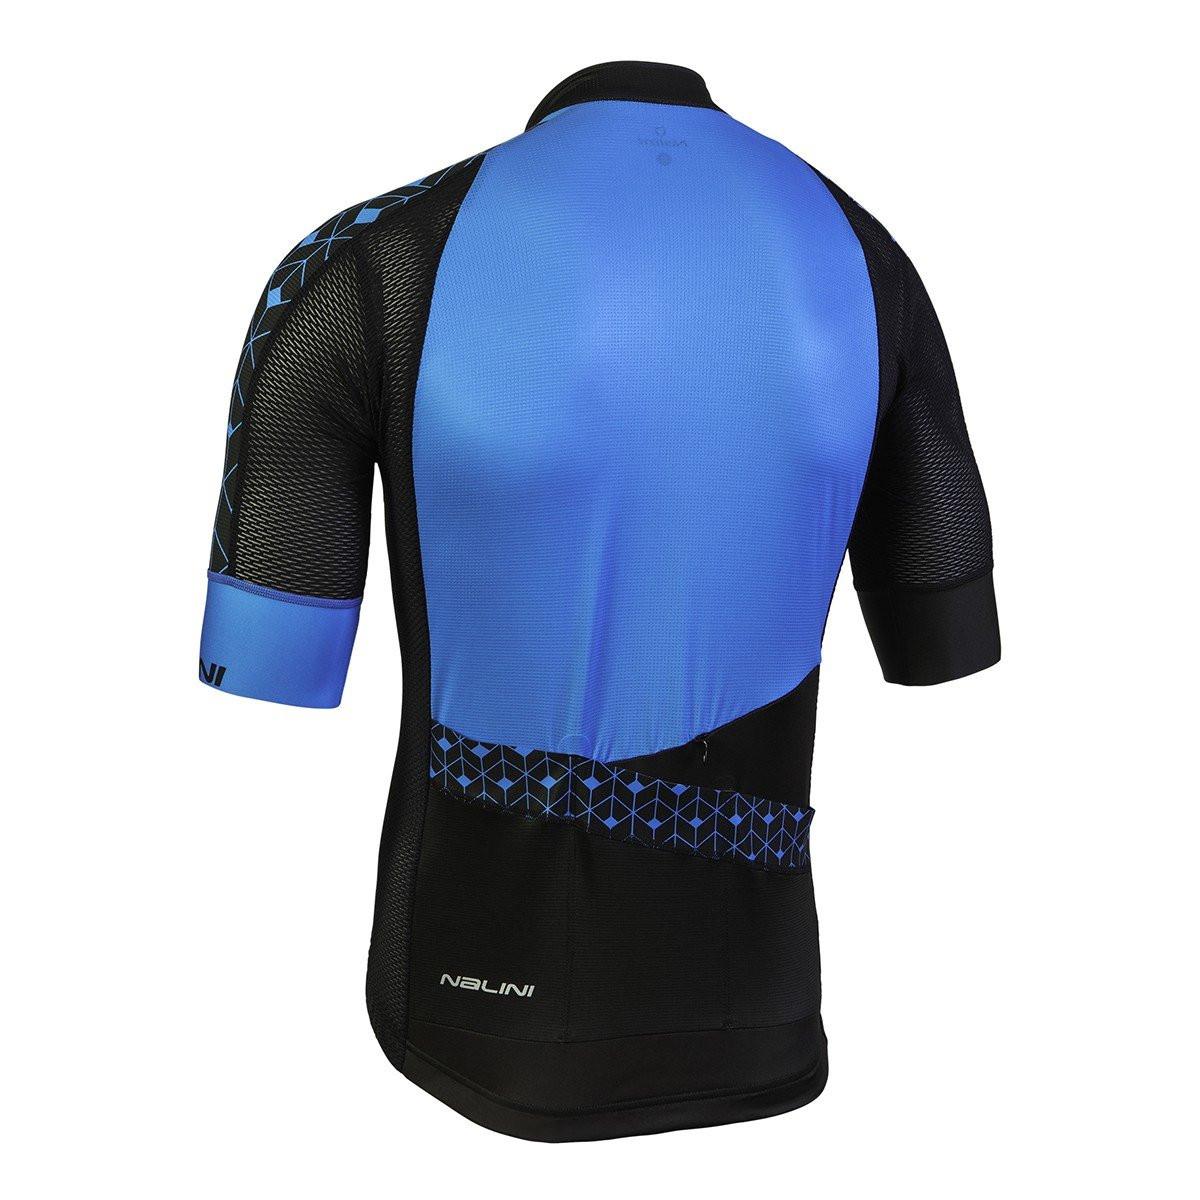 Nalini Velocita Blue Black Jersey Rear